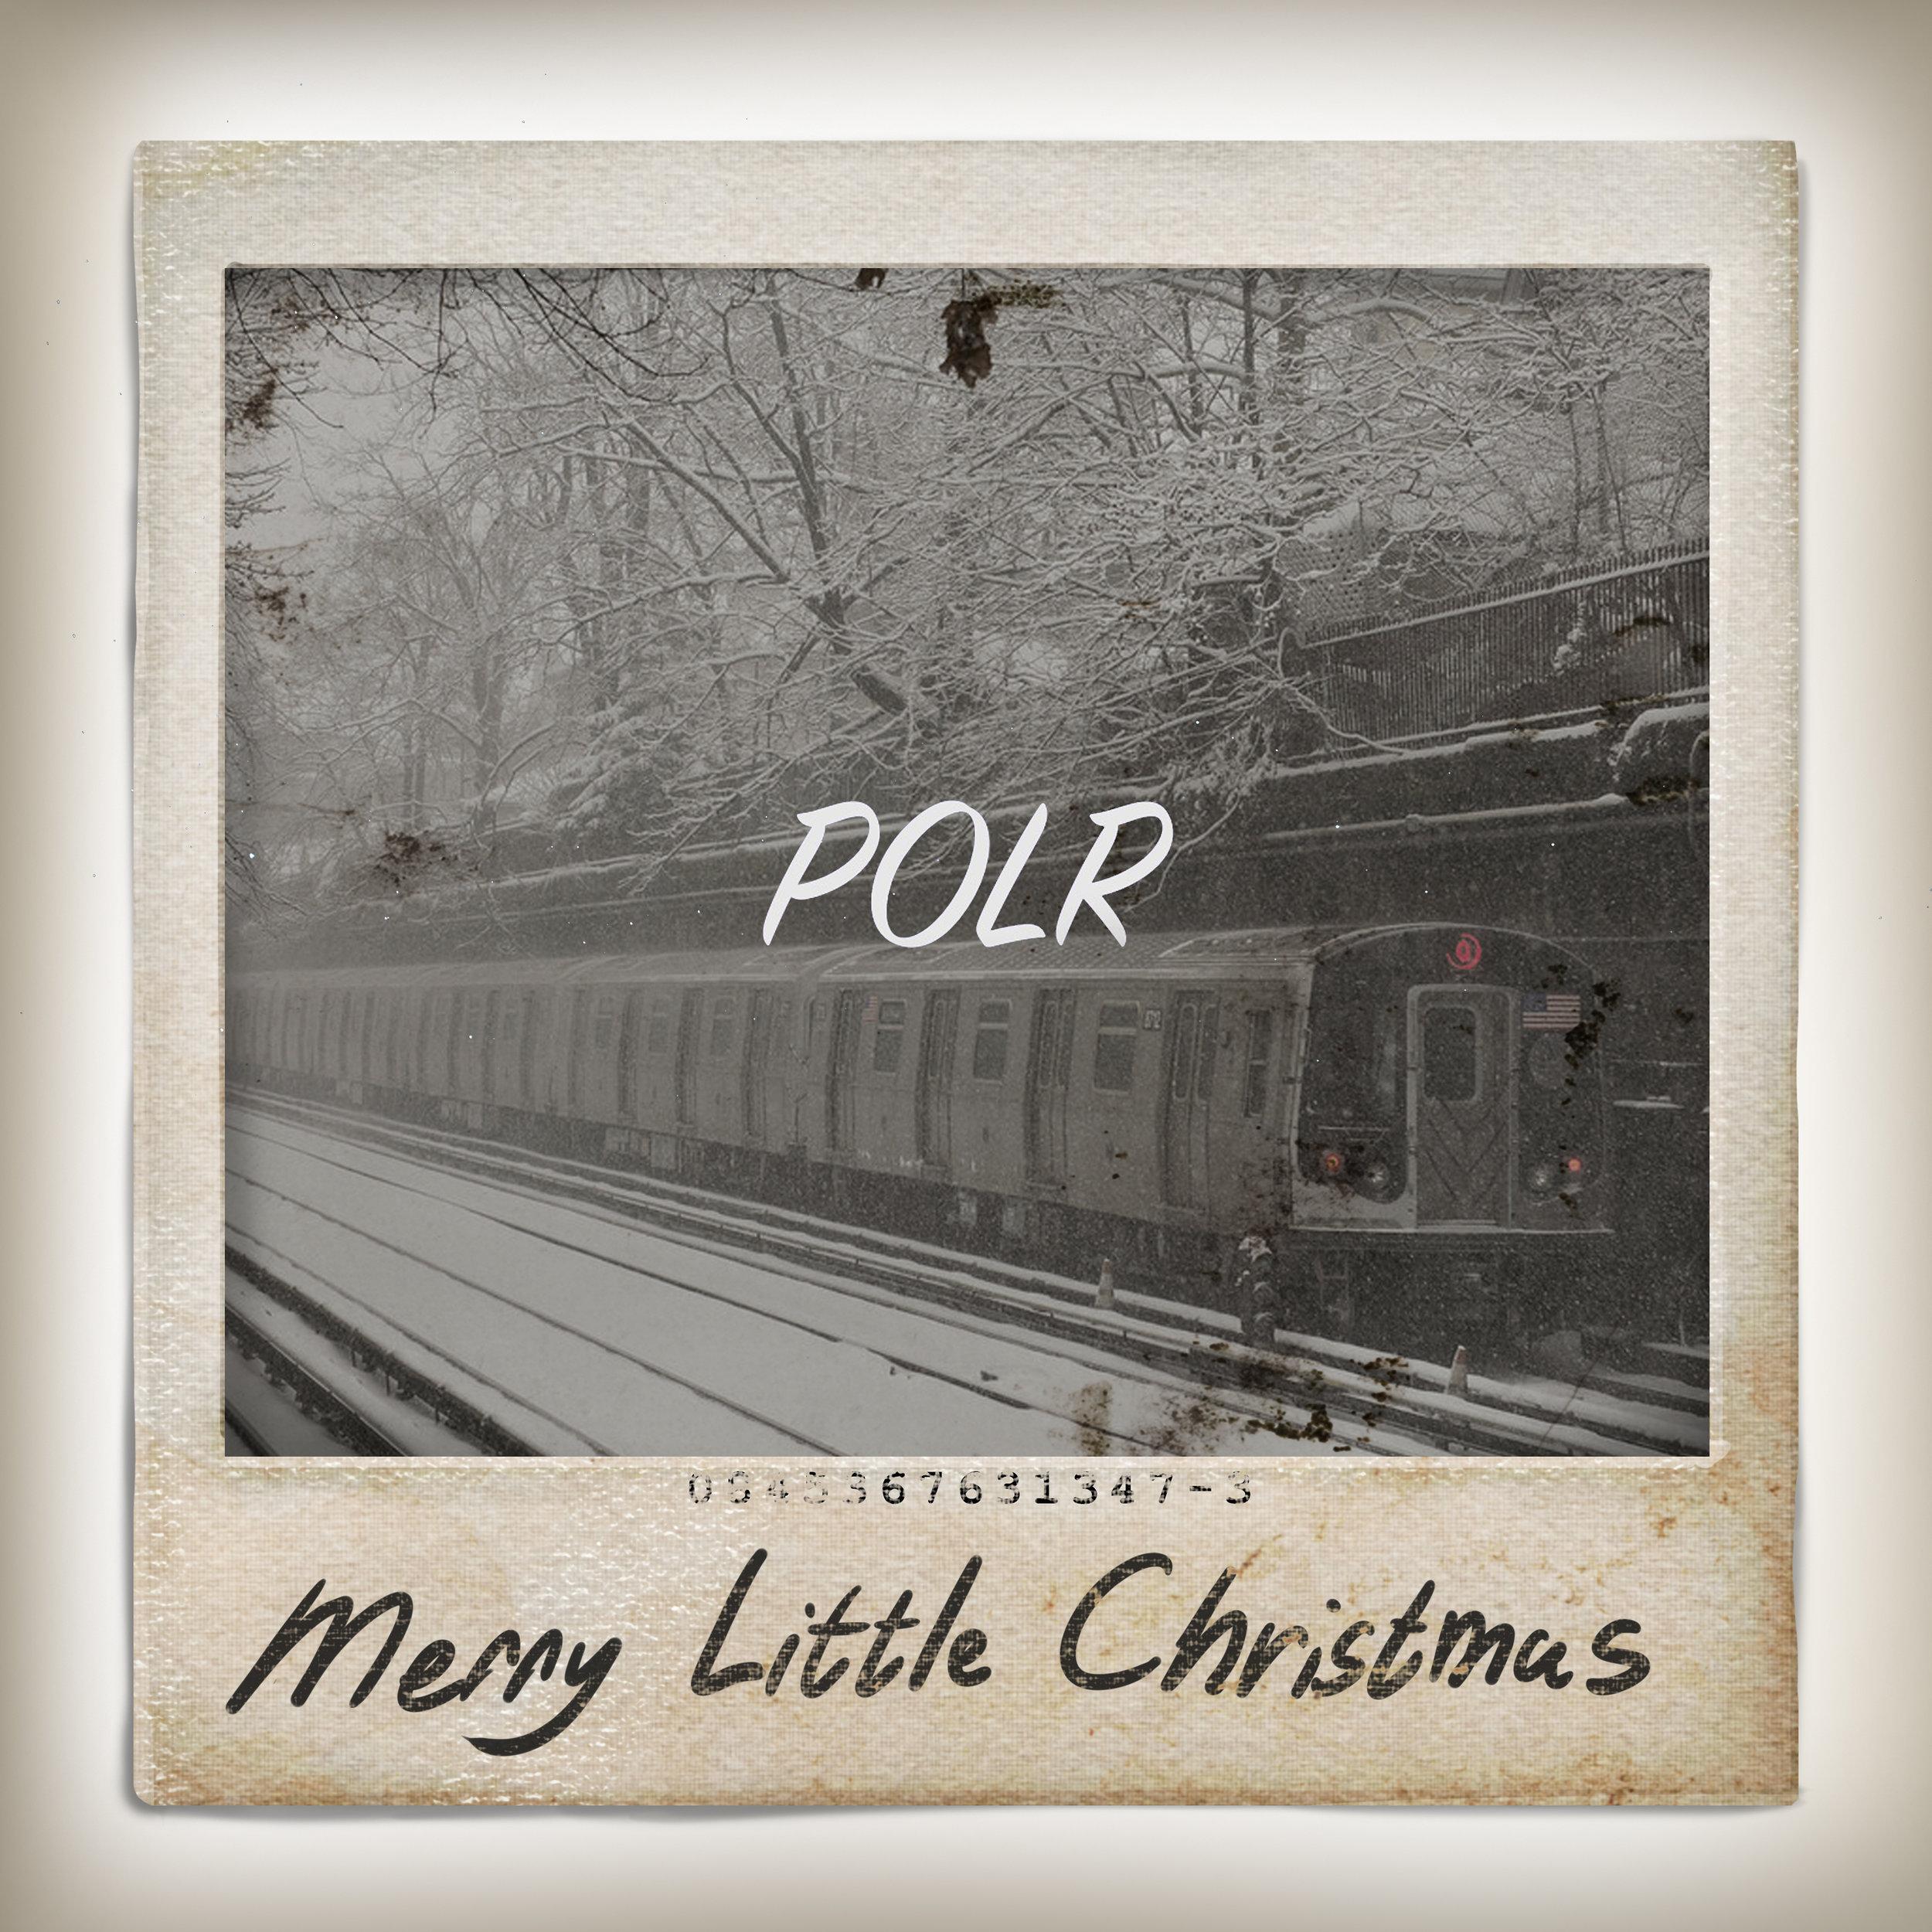 Merry Lil' Christmas 3300p.jpg